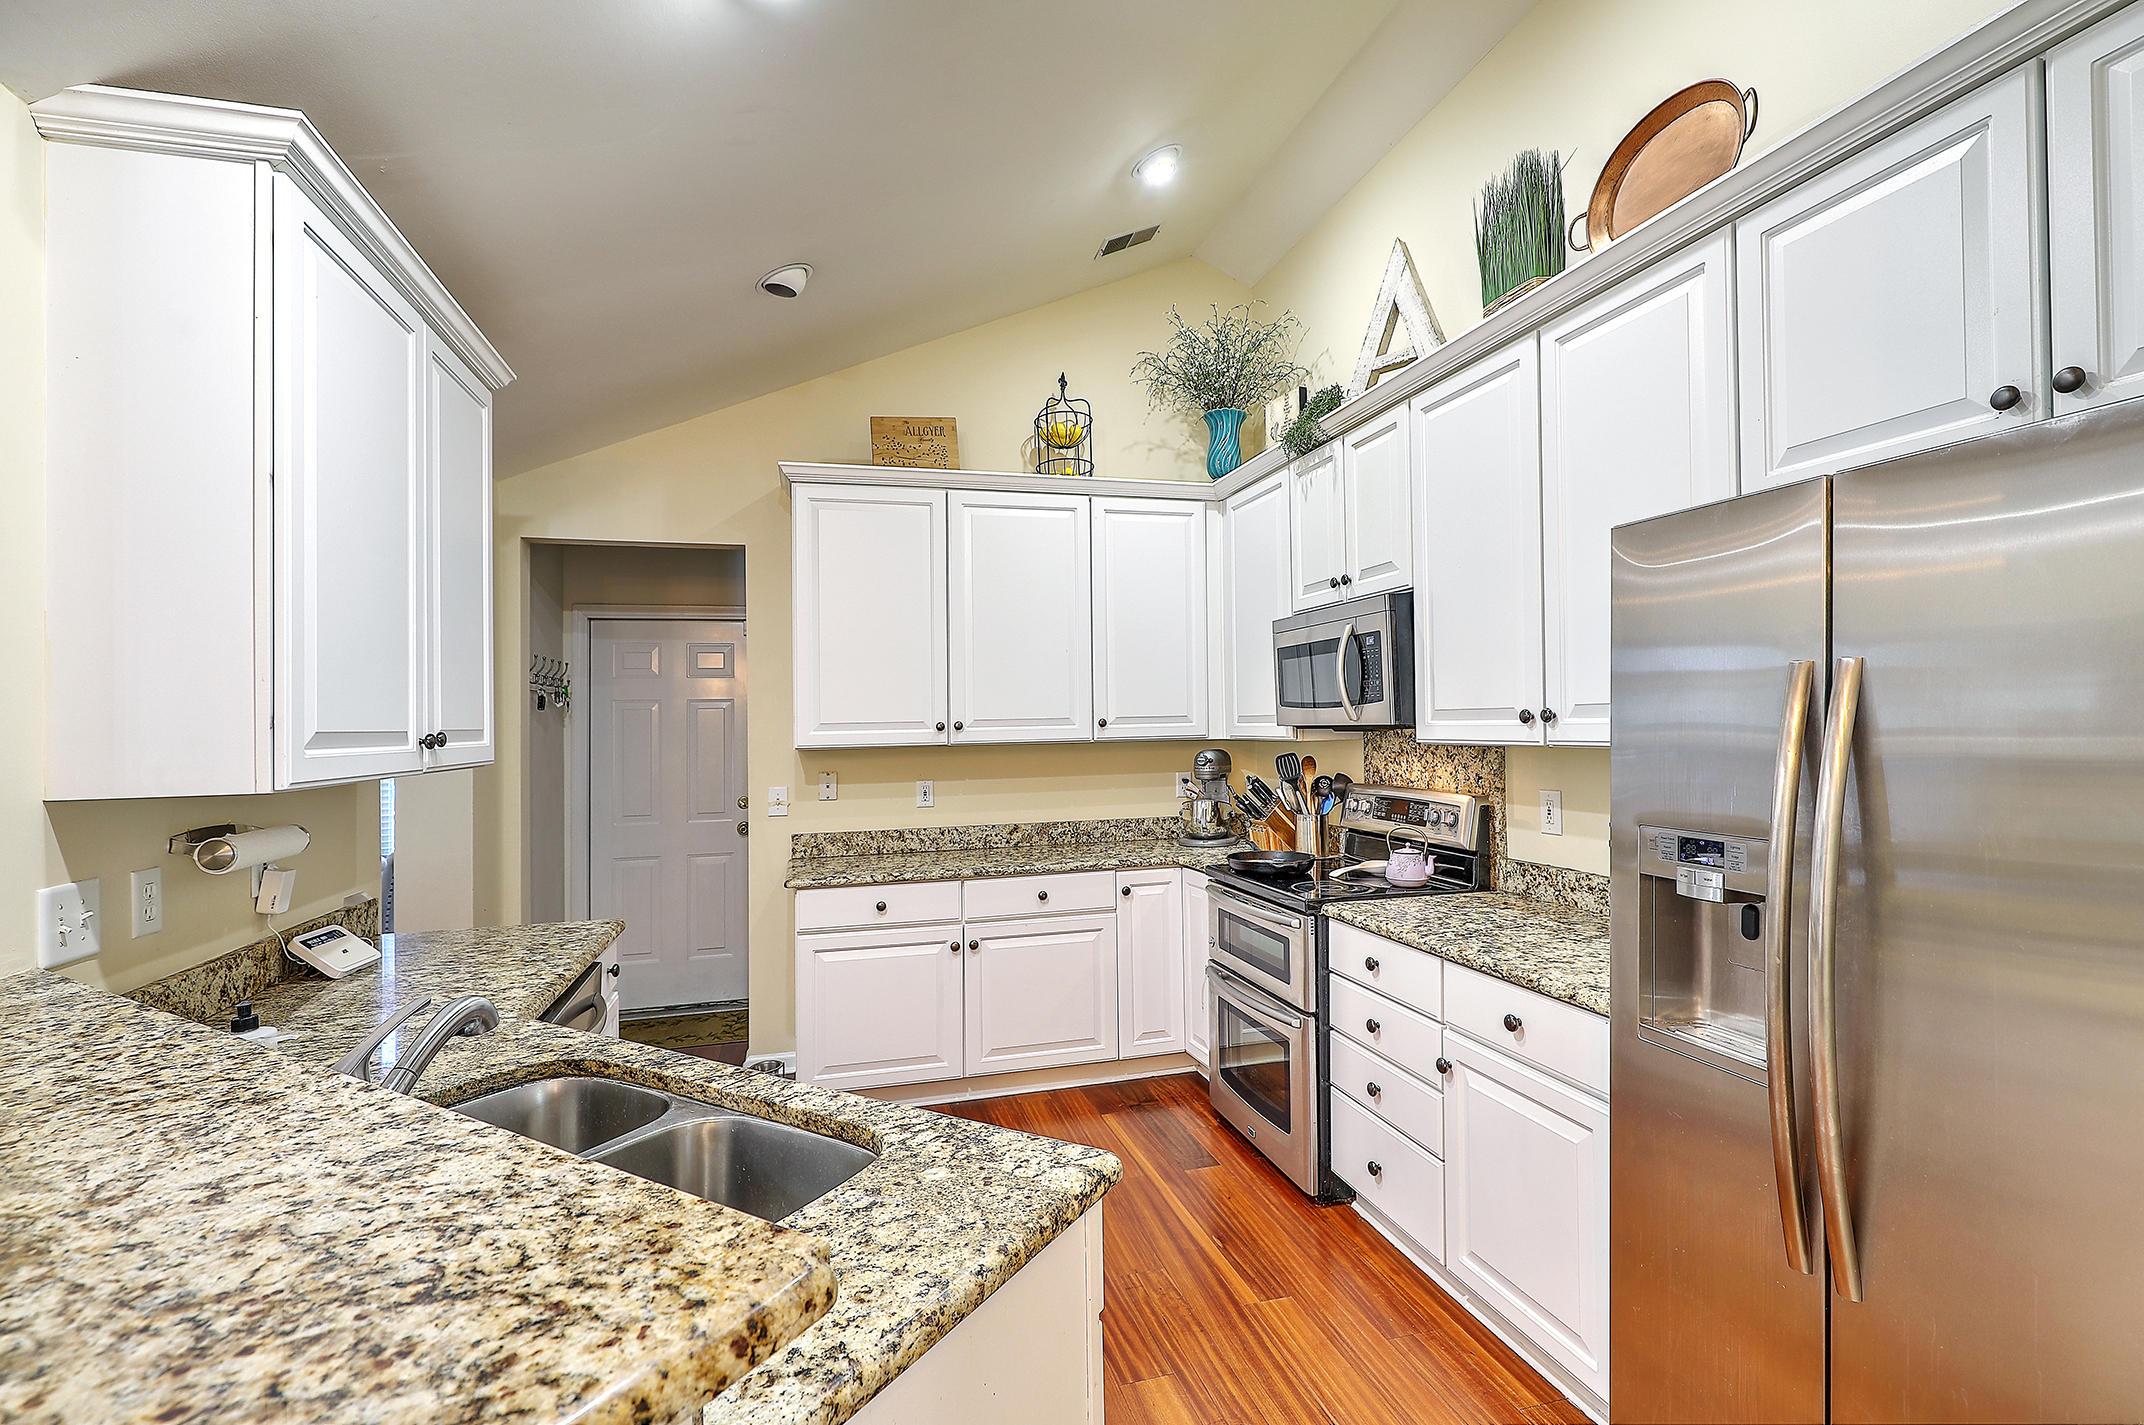 Dunes West Homes For Sale - 1471 Cypress Pointe, Mount Pleasant, SC - 20